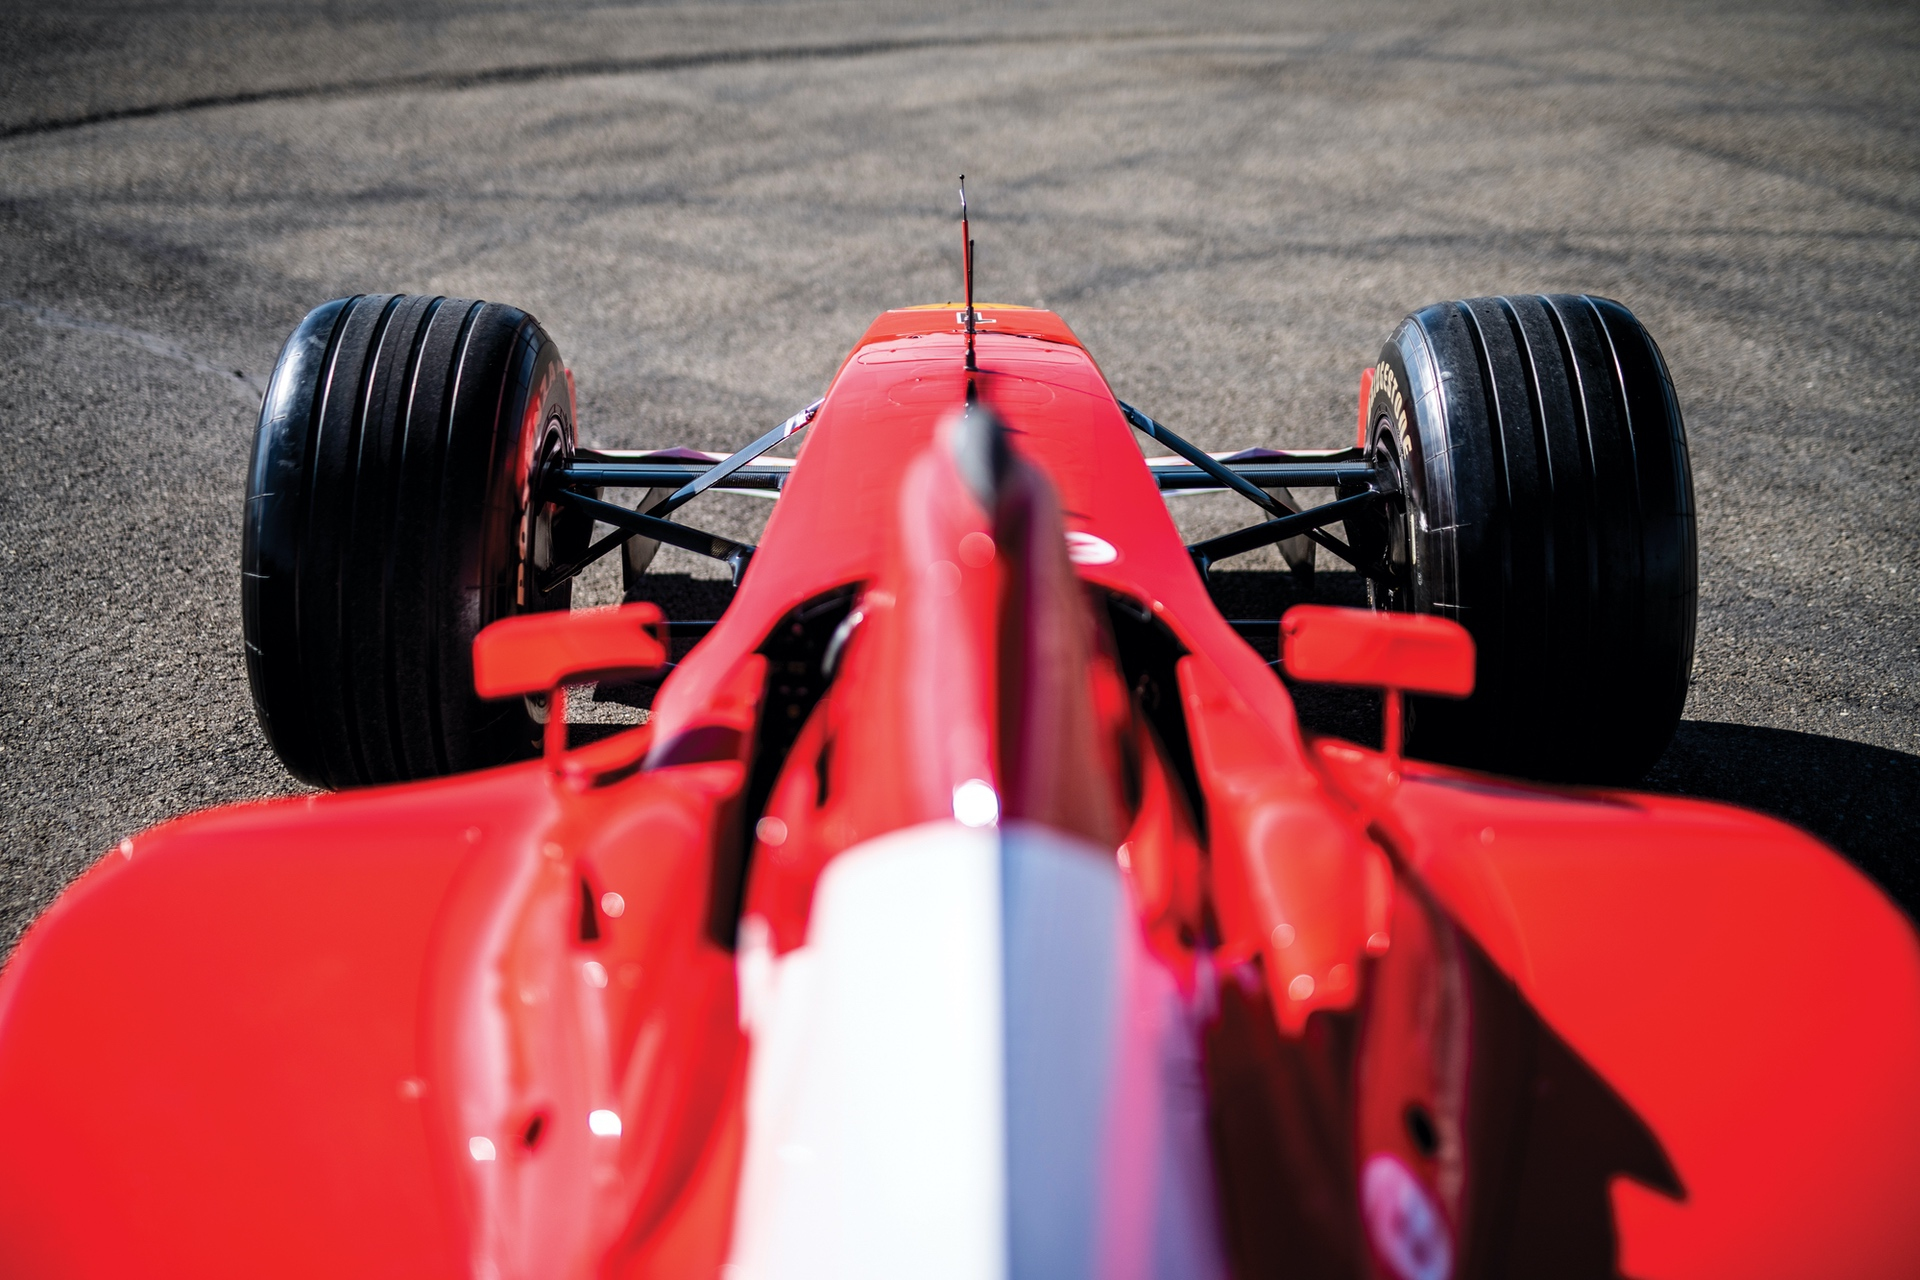 Mick_Schumacher_Ferrari_F2002_0021